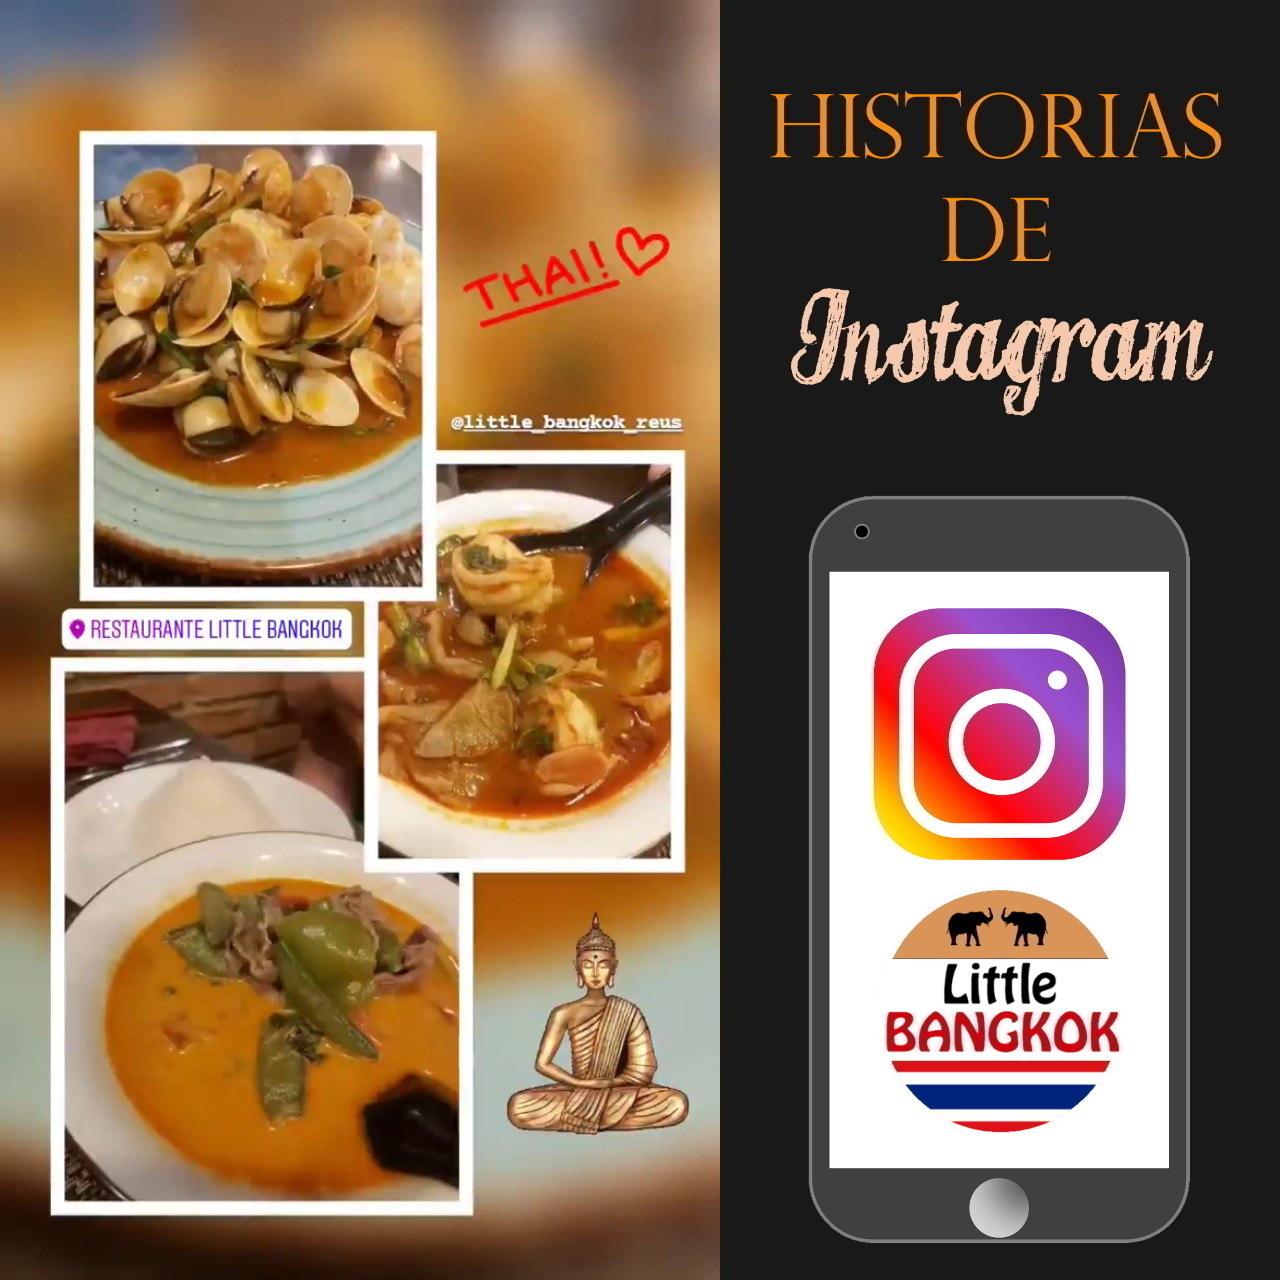 Historias de Instagram - 09 - Setembre